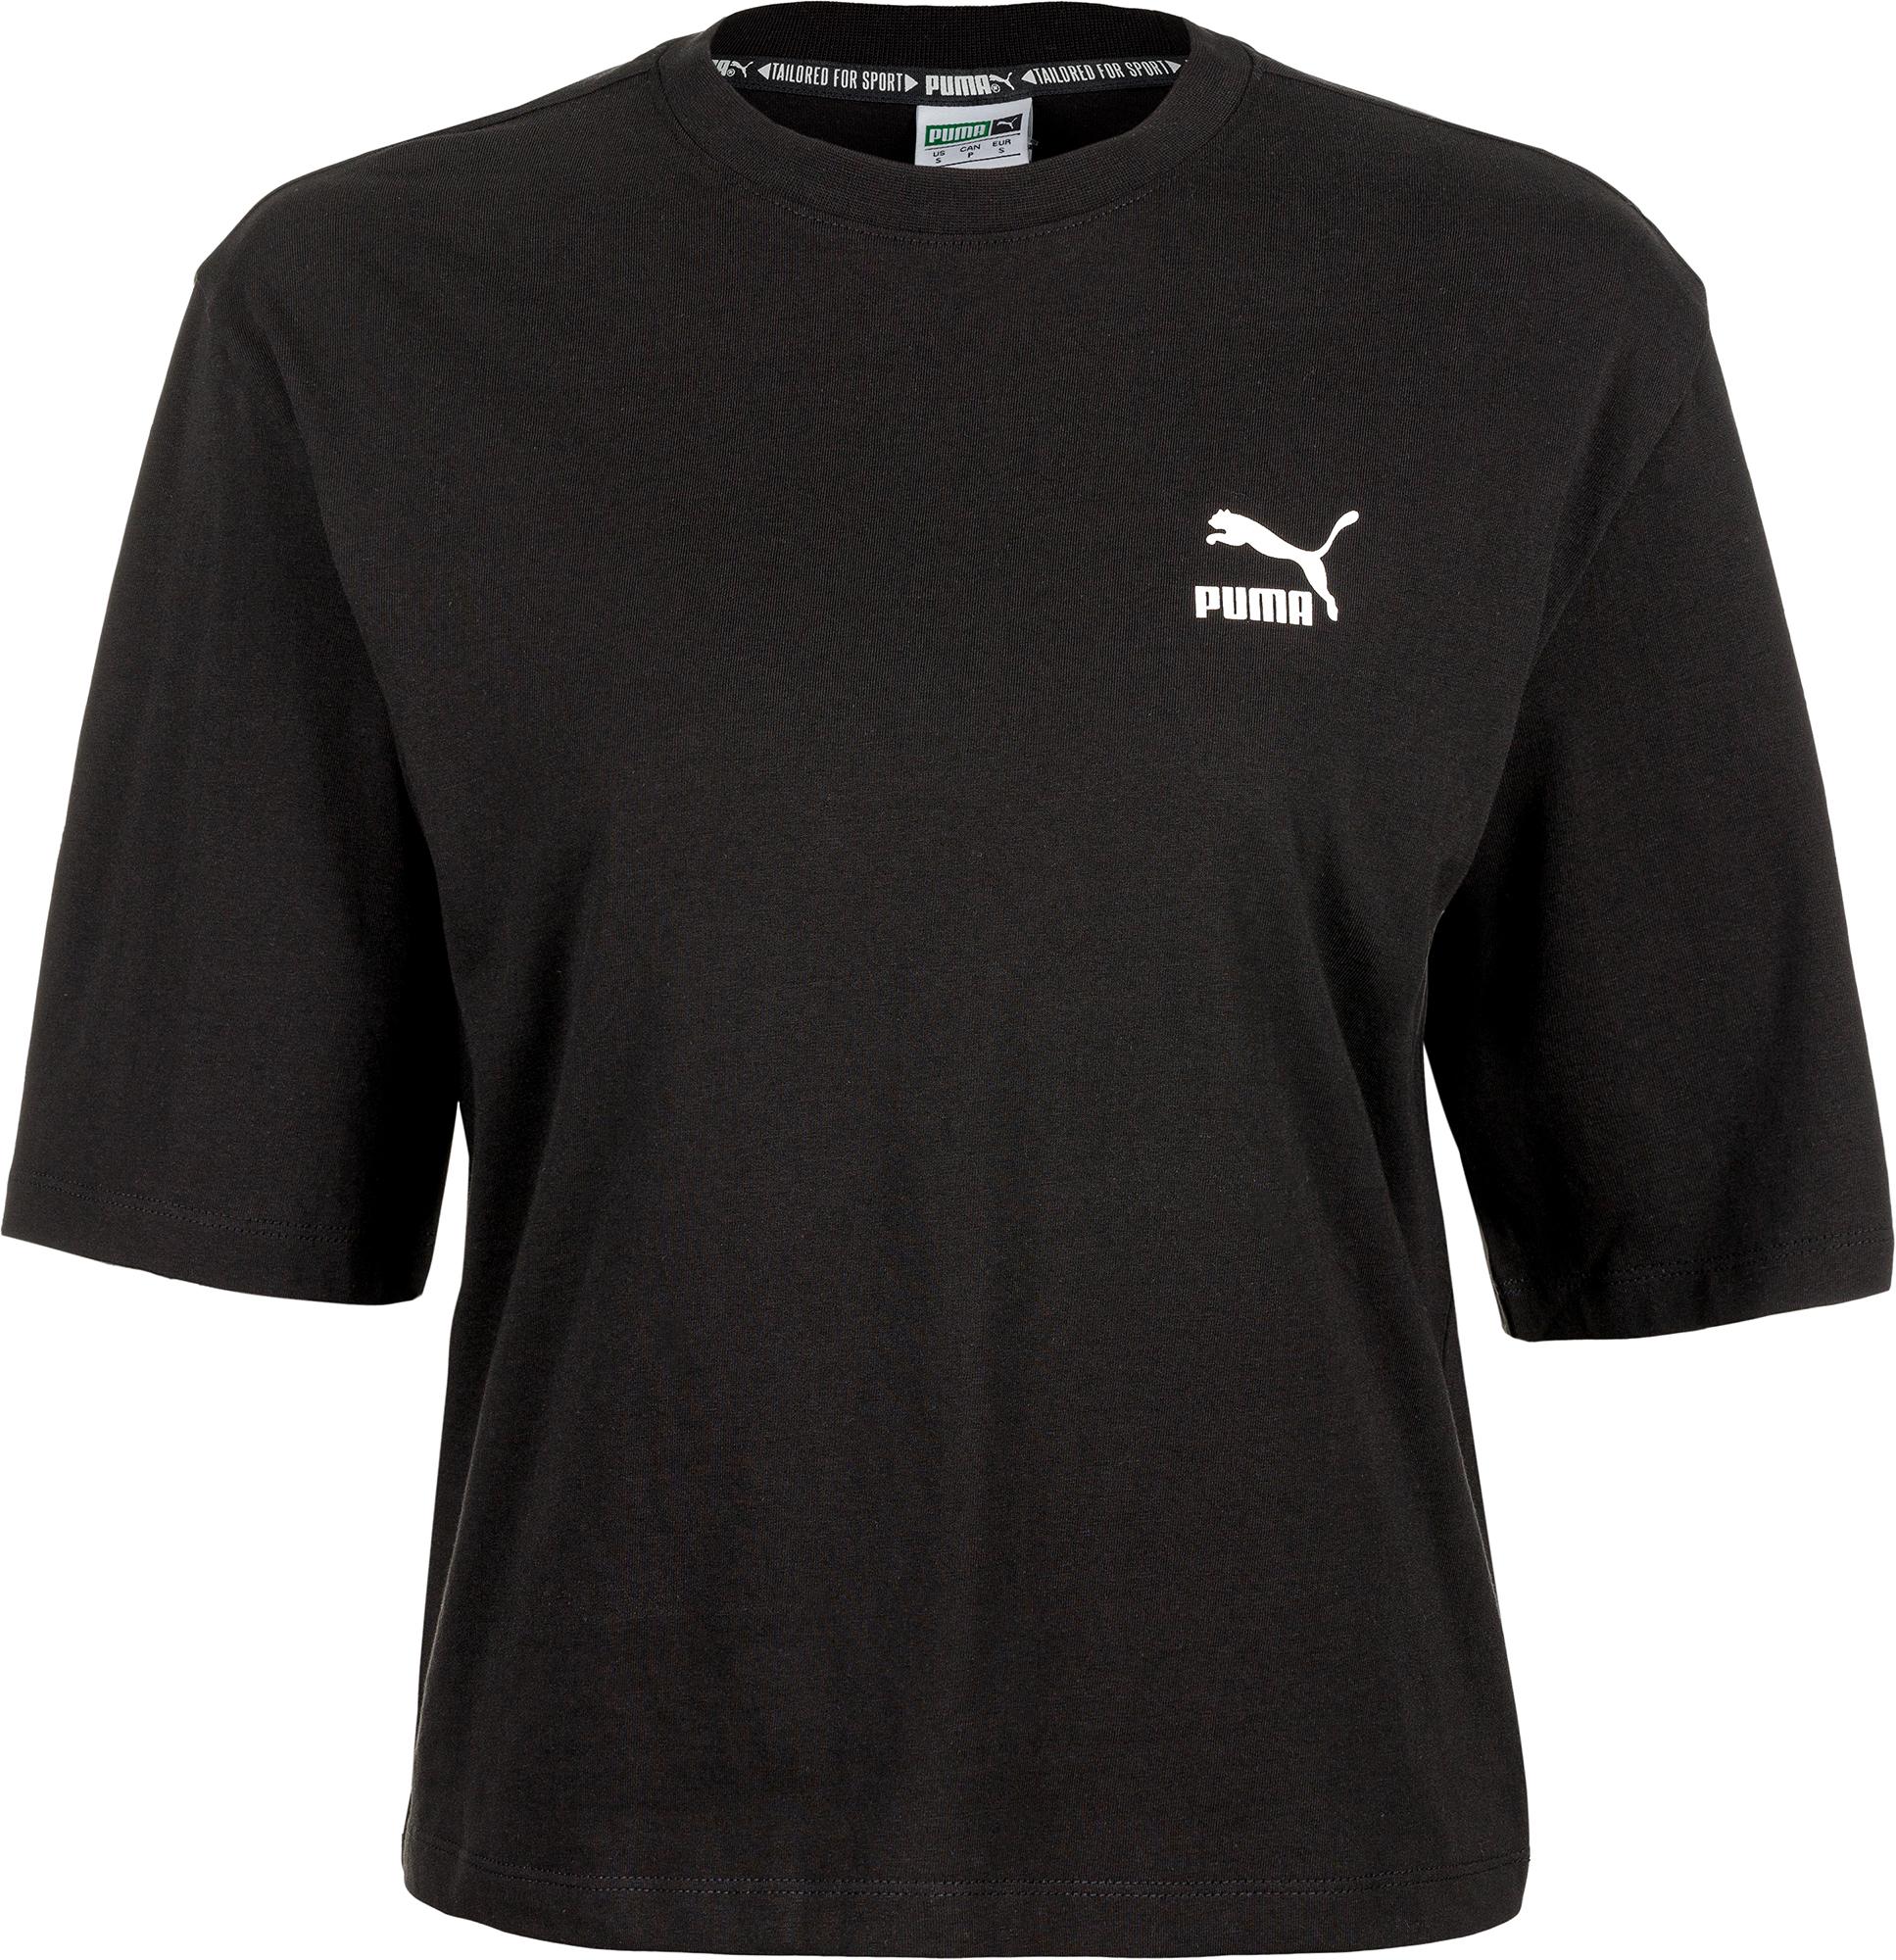 Puma Футболка женская Puma TFS Graphic Tee, размер 44-46 футболка женская levi s® tees graphic ss цвет розовый 1736904090 размер xl 50